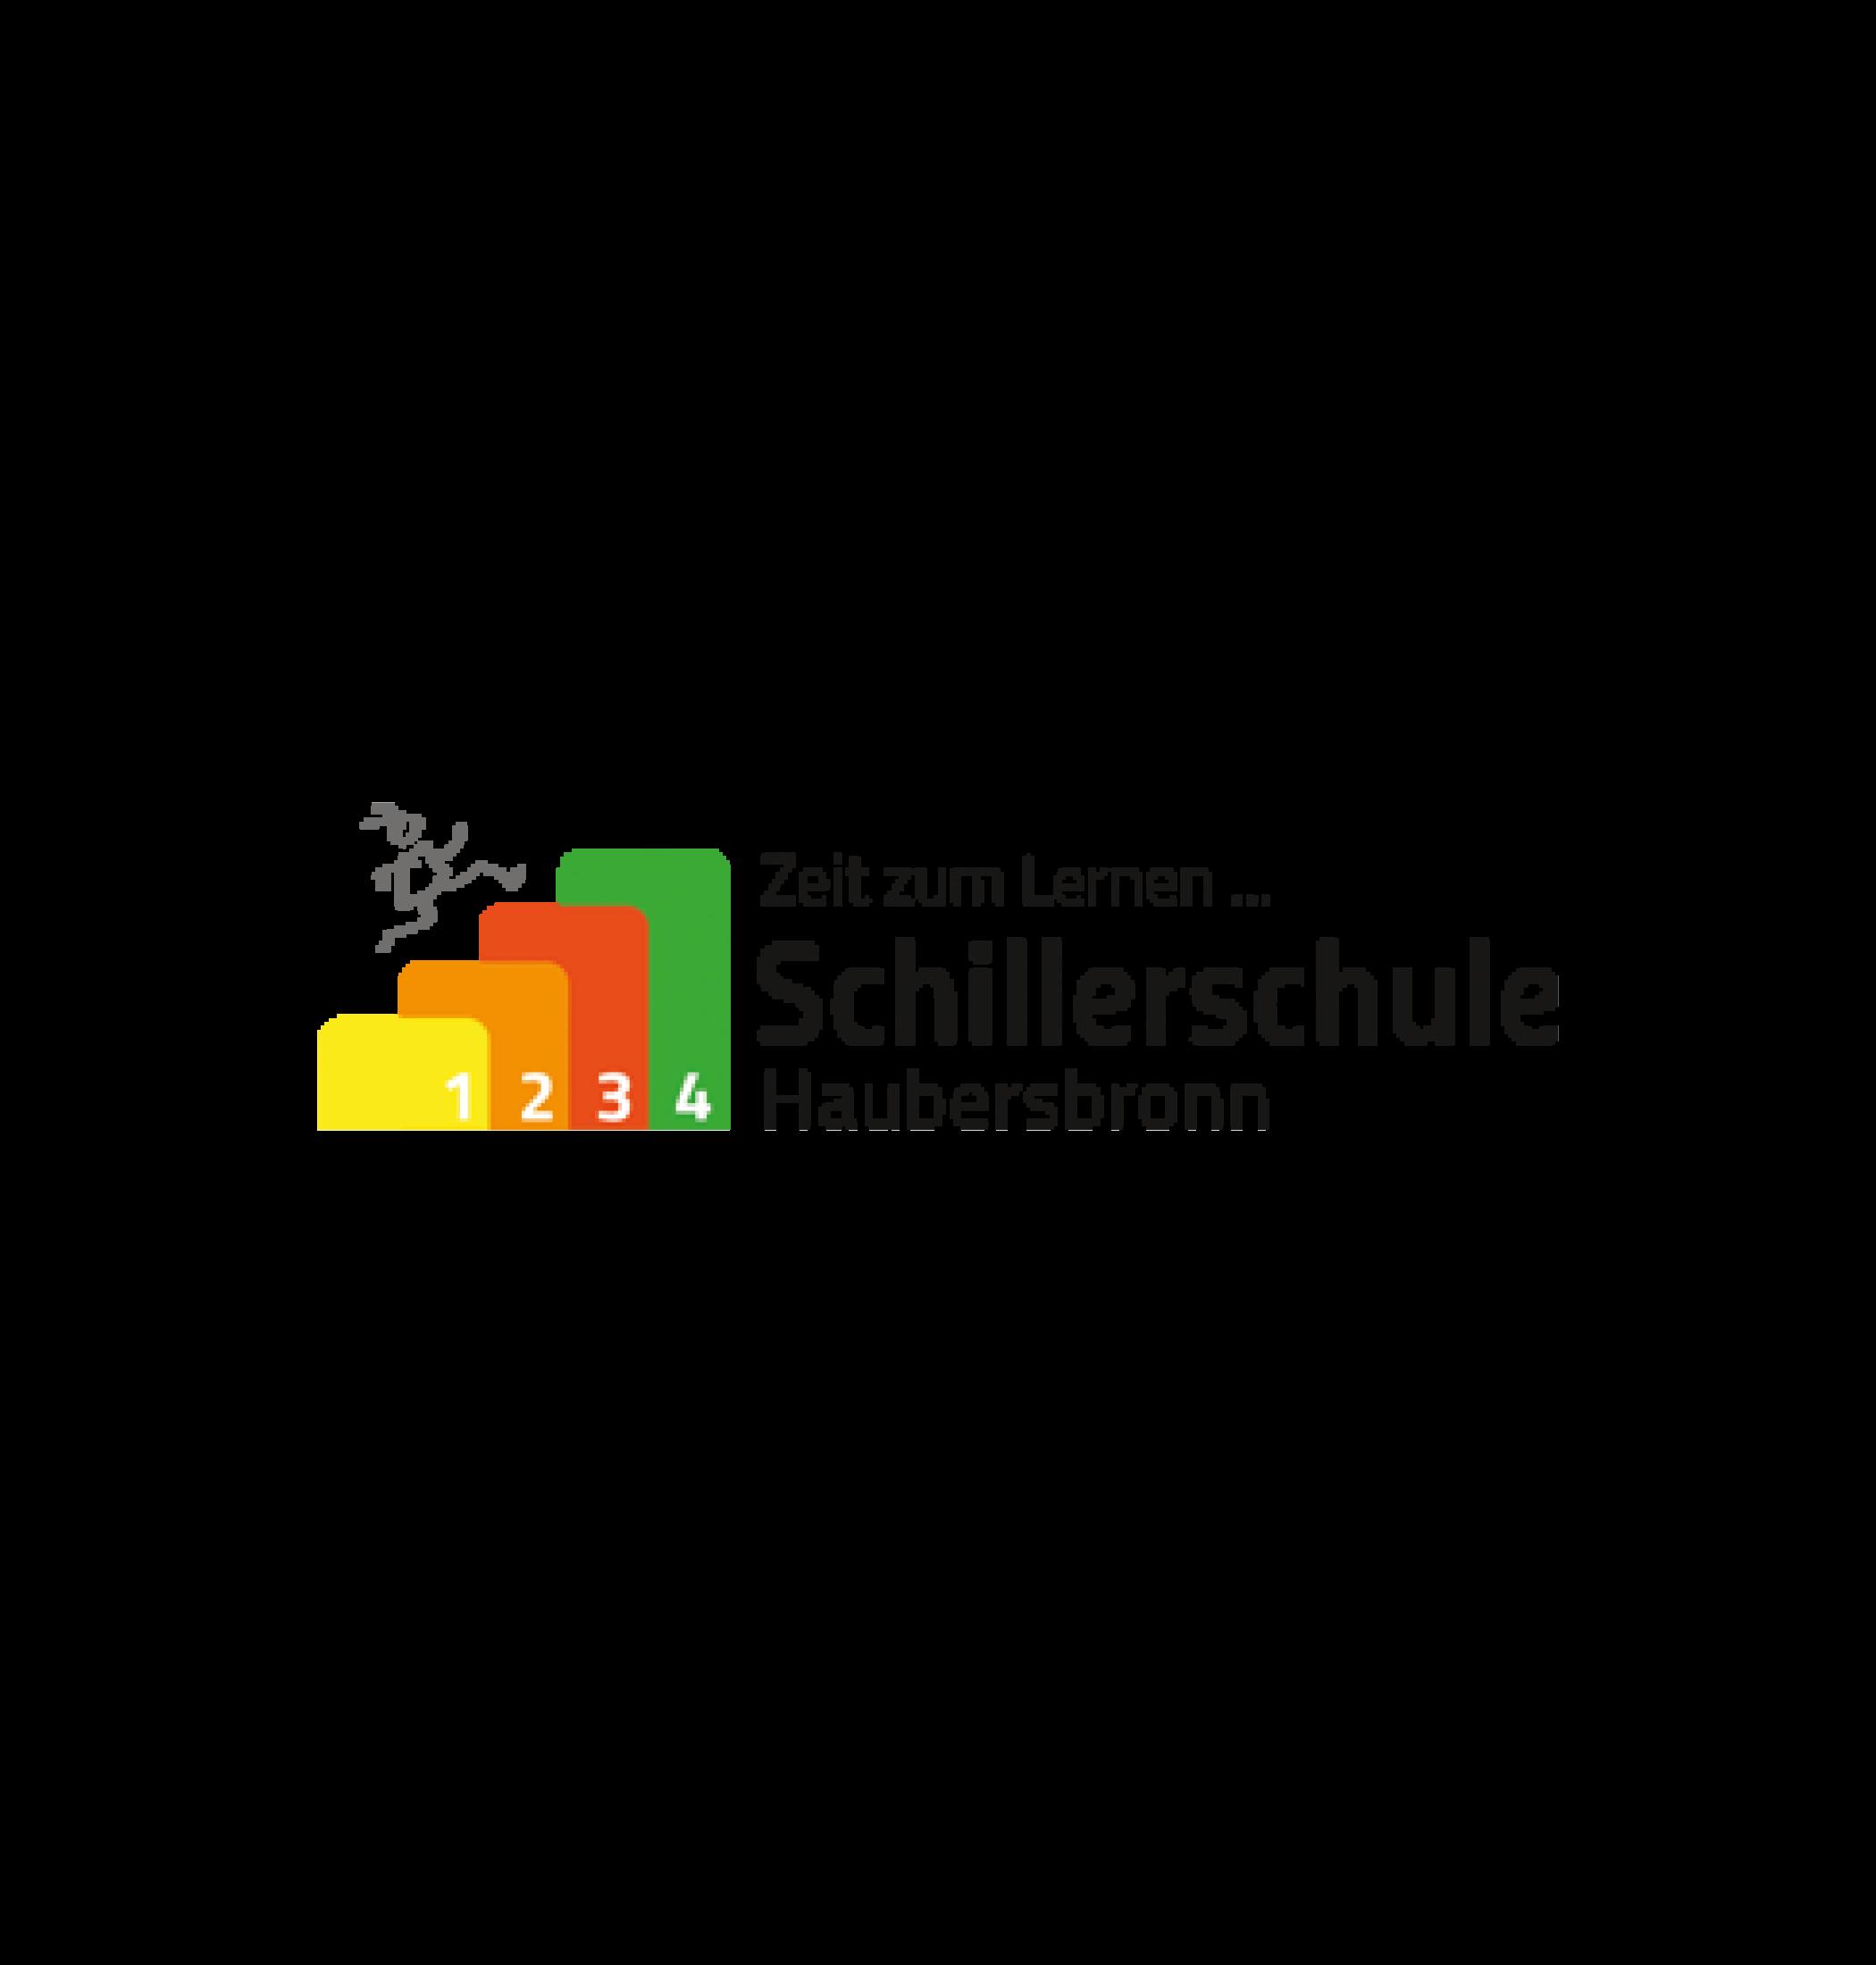 Logo Schillerschule Haubersbronn